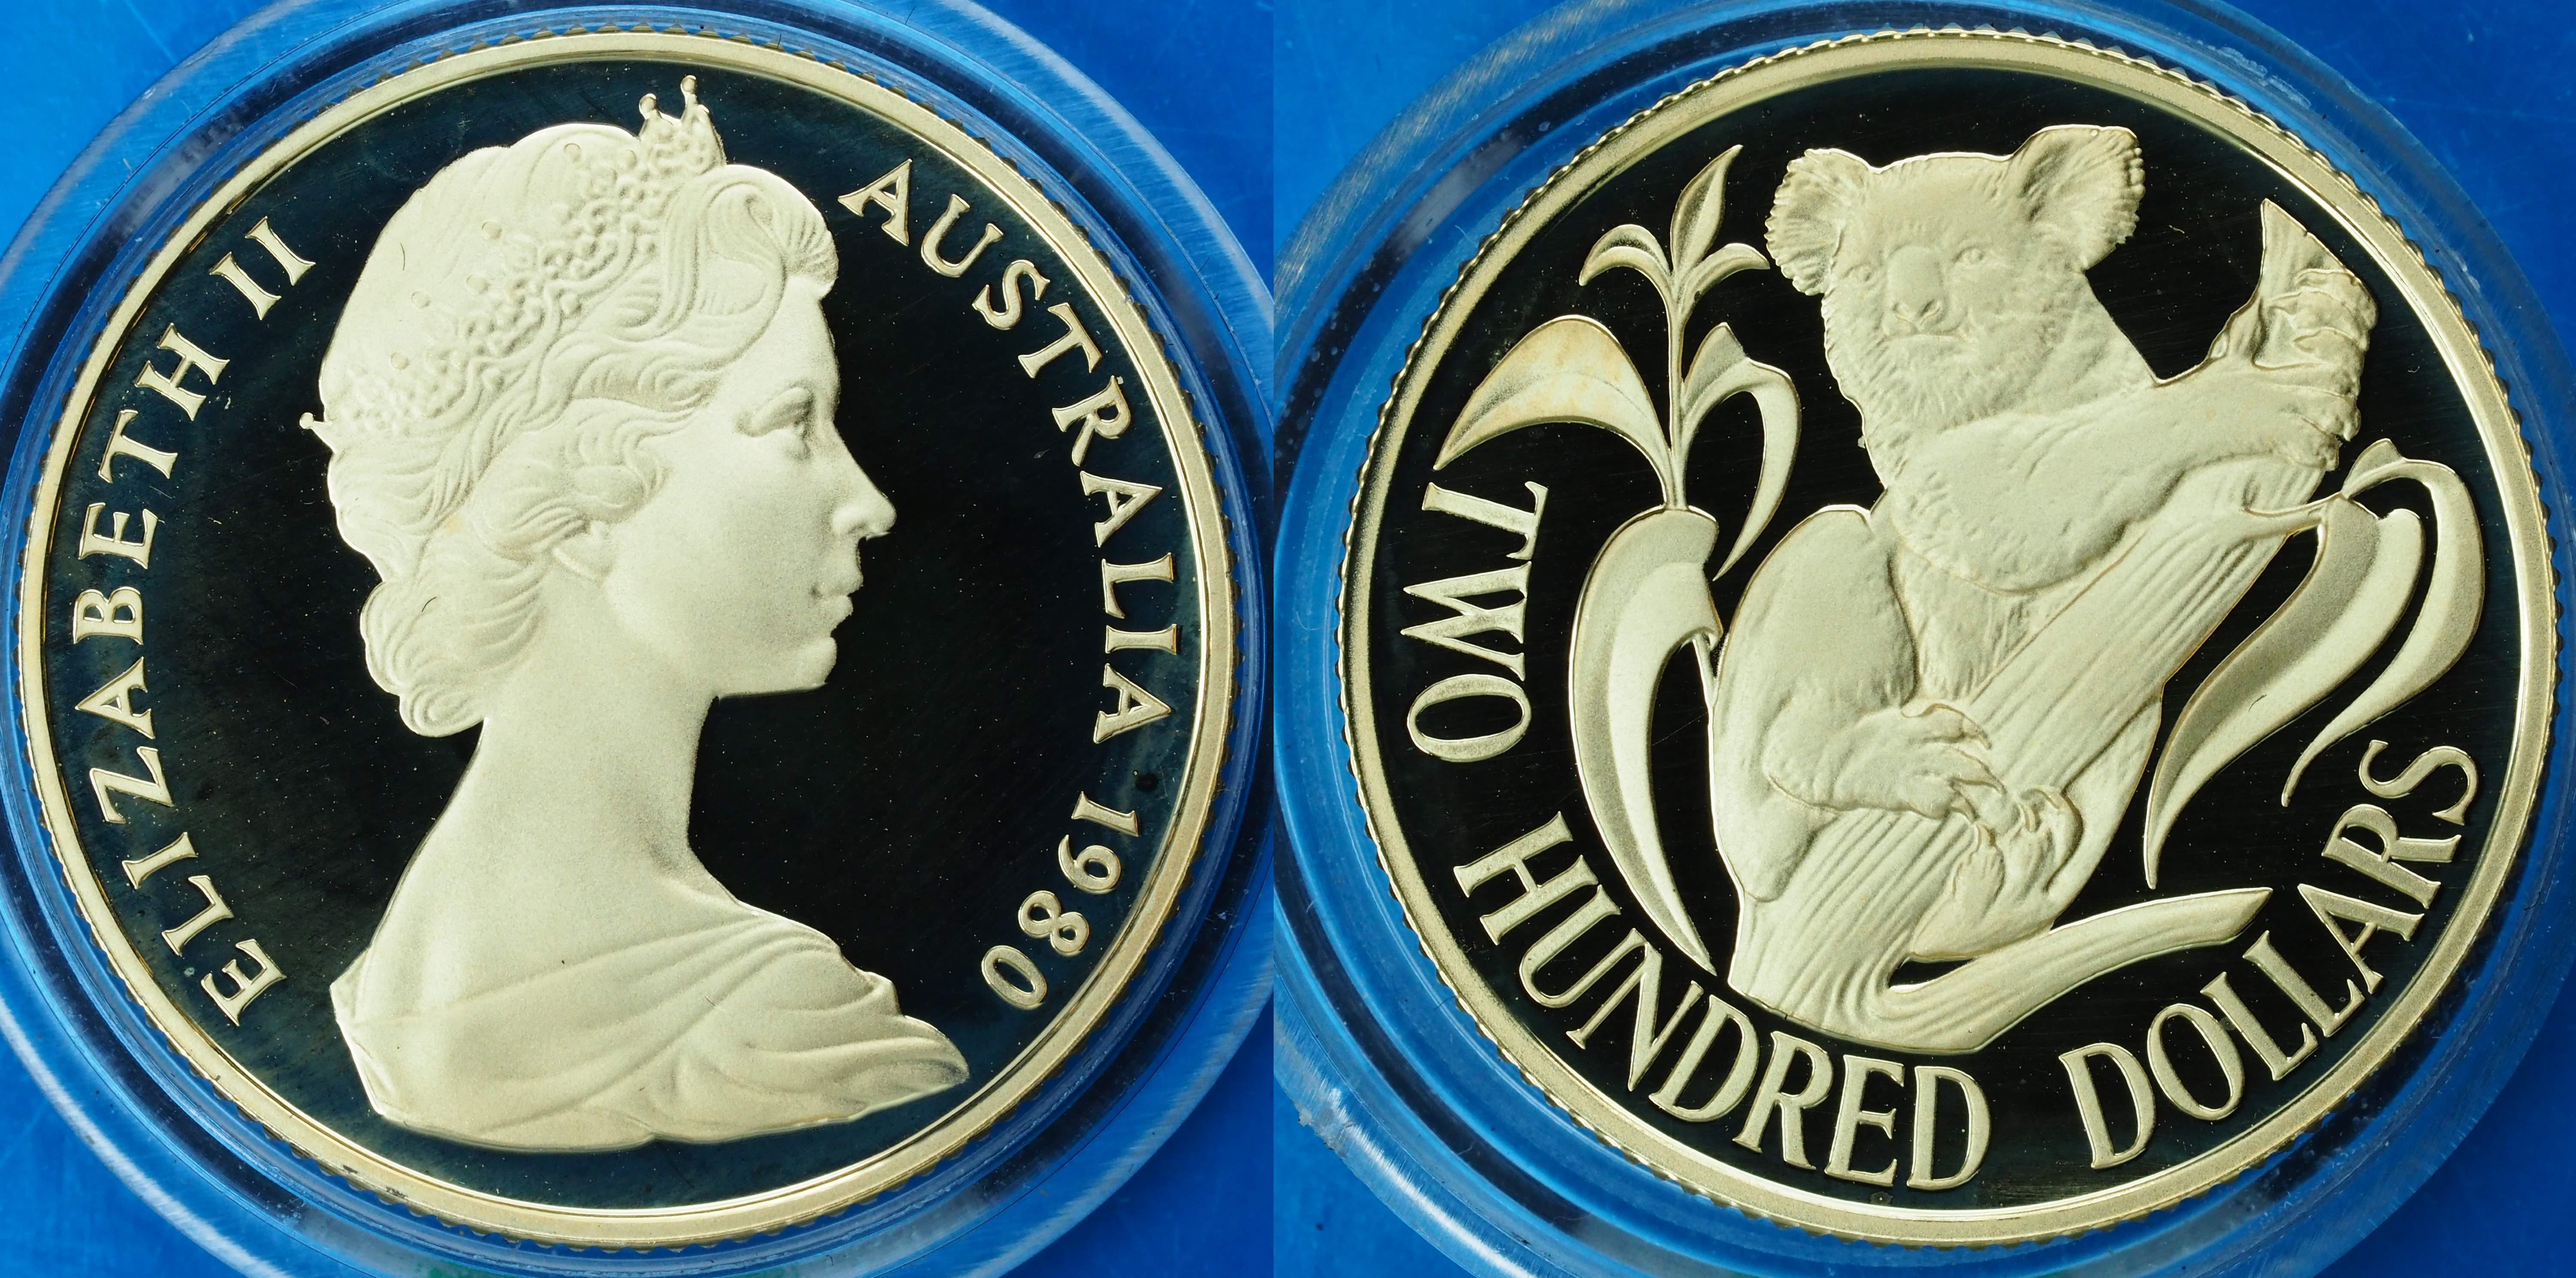 Australia 1980 Koala Proof $200 Coin